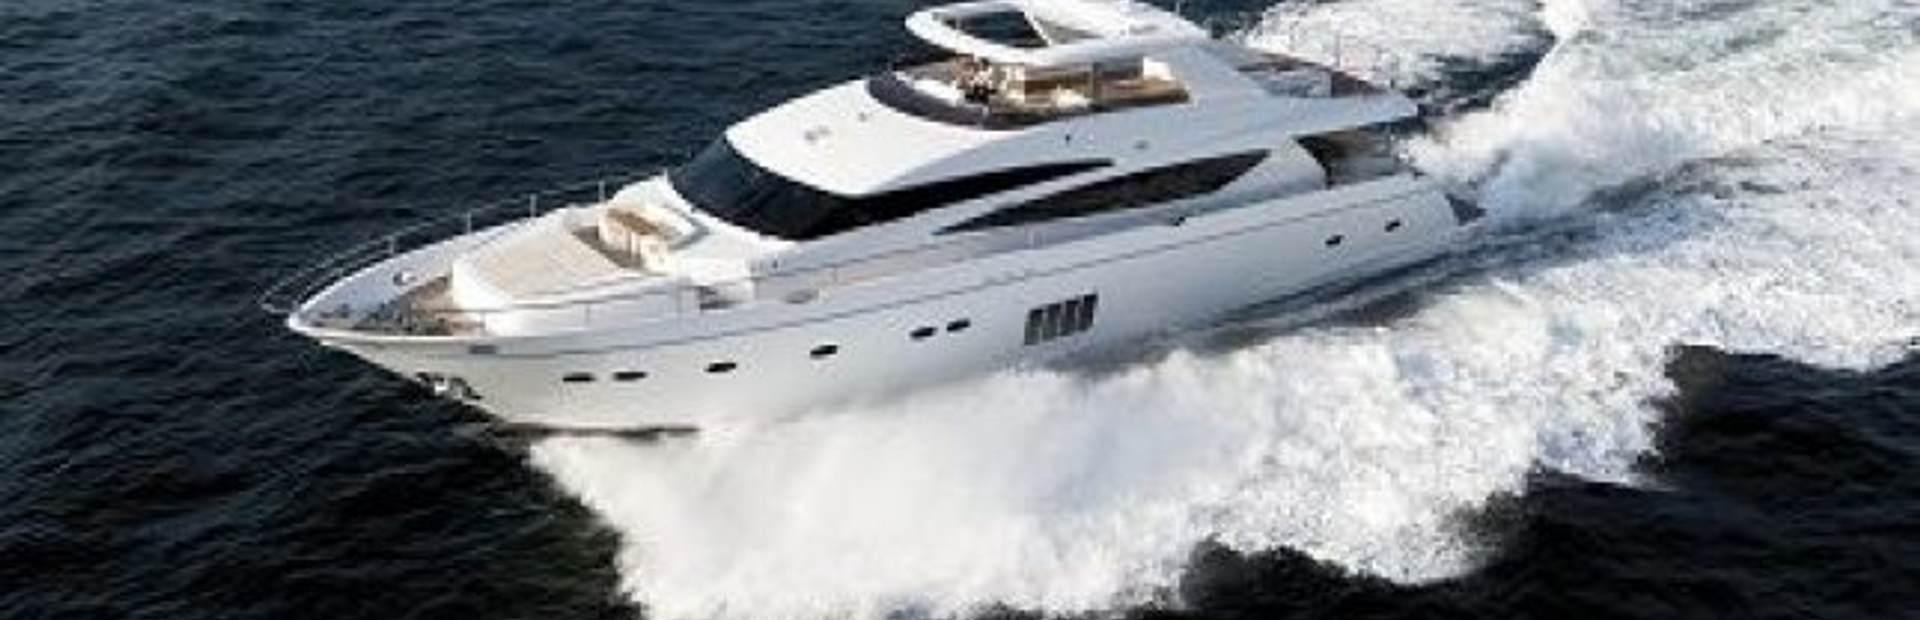 Princess 98 Motor Yacht Yacht Charter